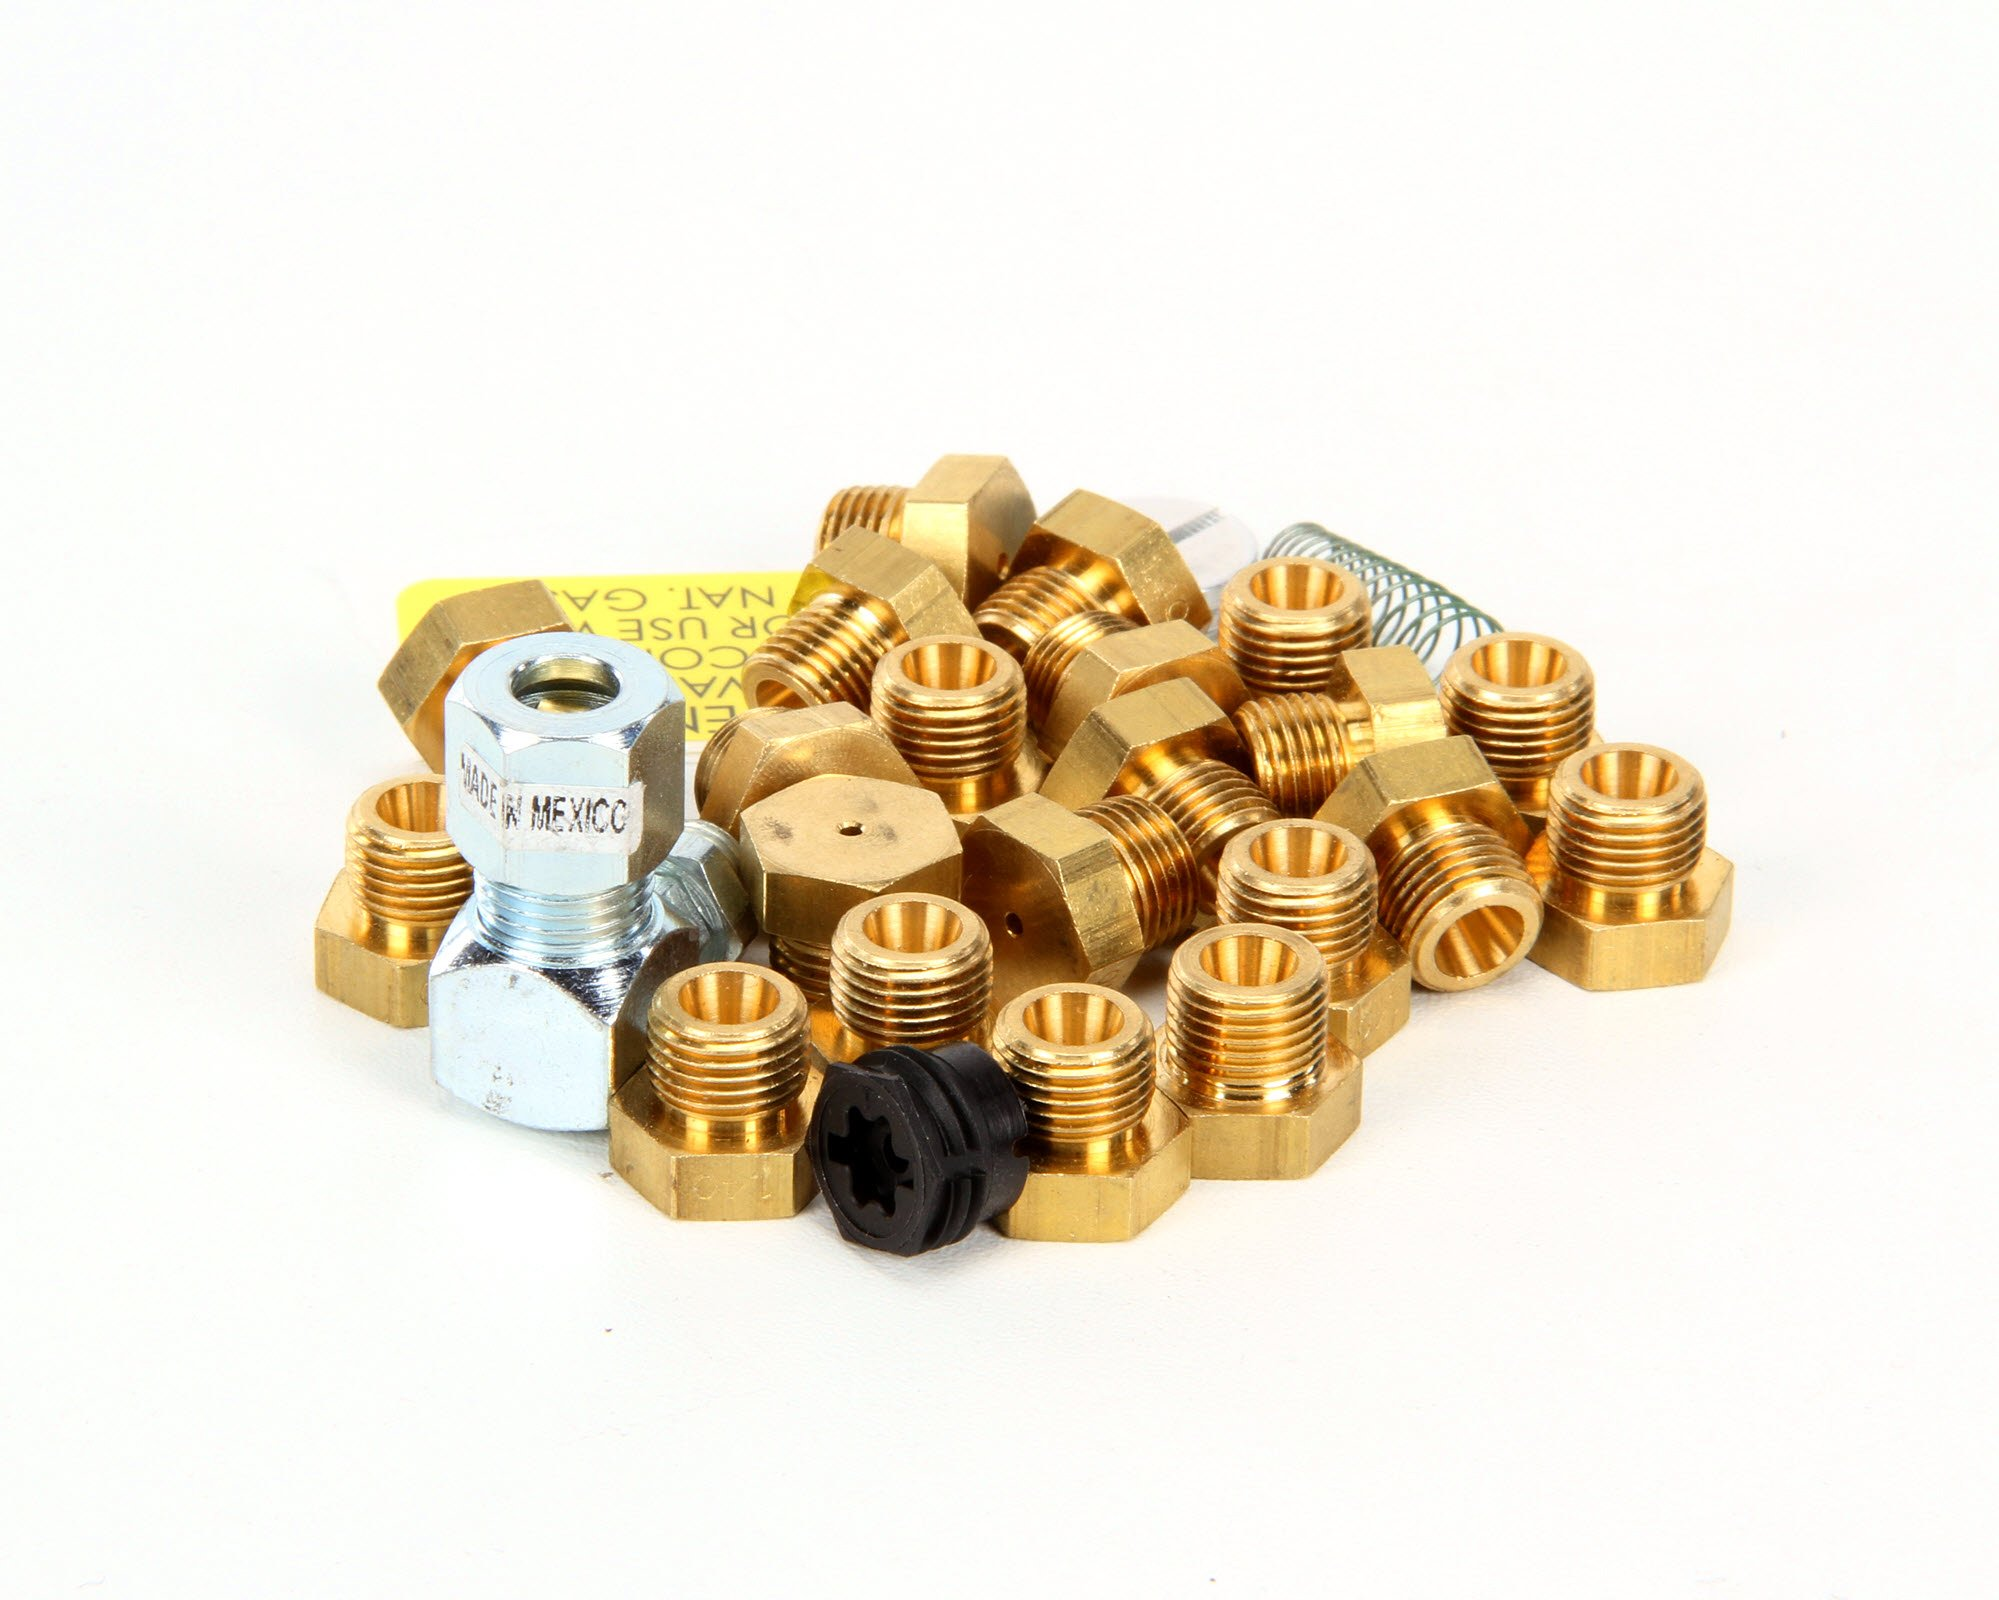 Frymaster 8261748 826-1748 Liquid Propane to Natural Gas Conversion Kit